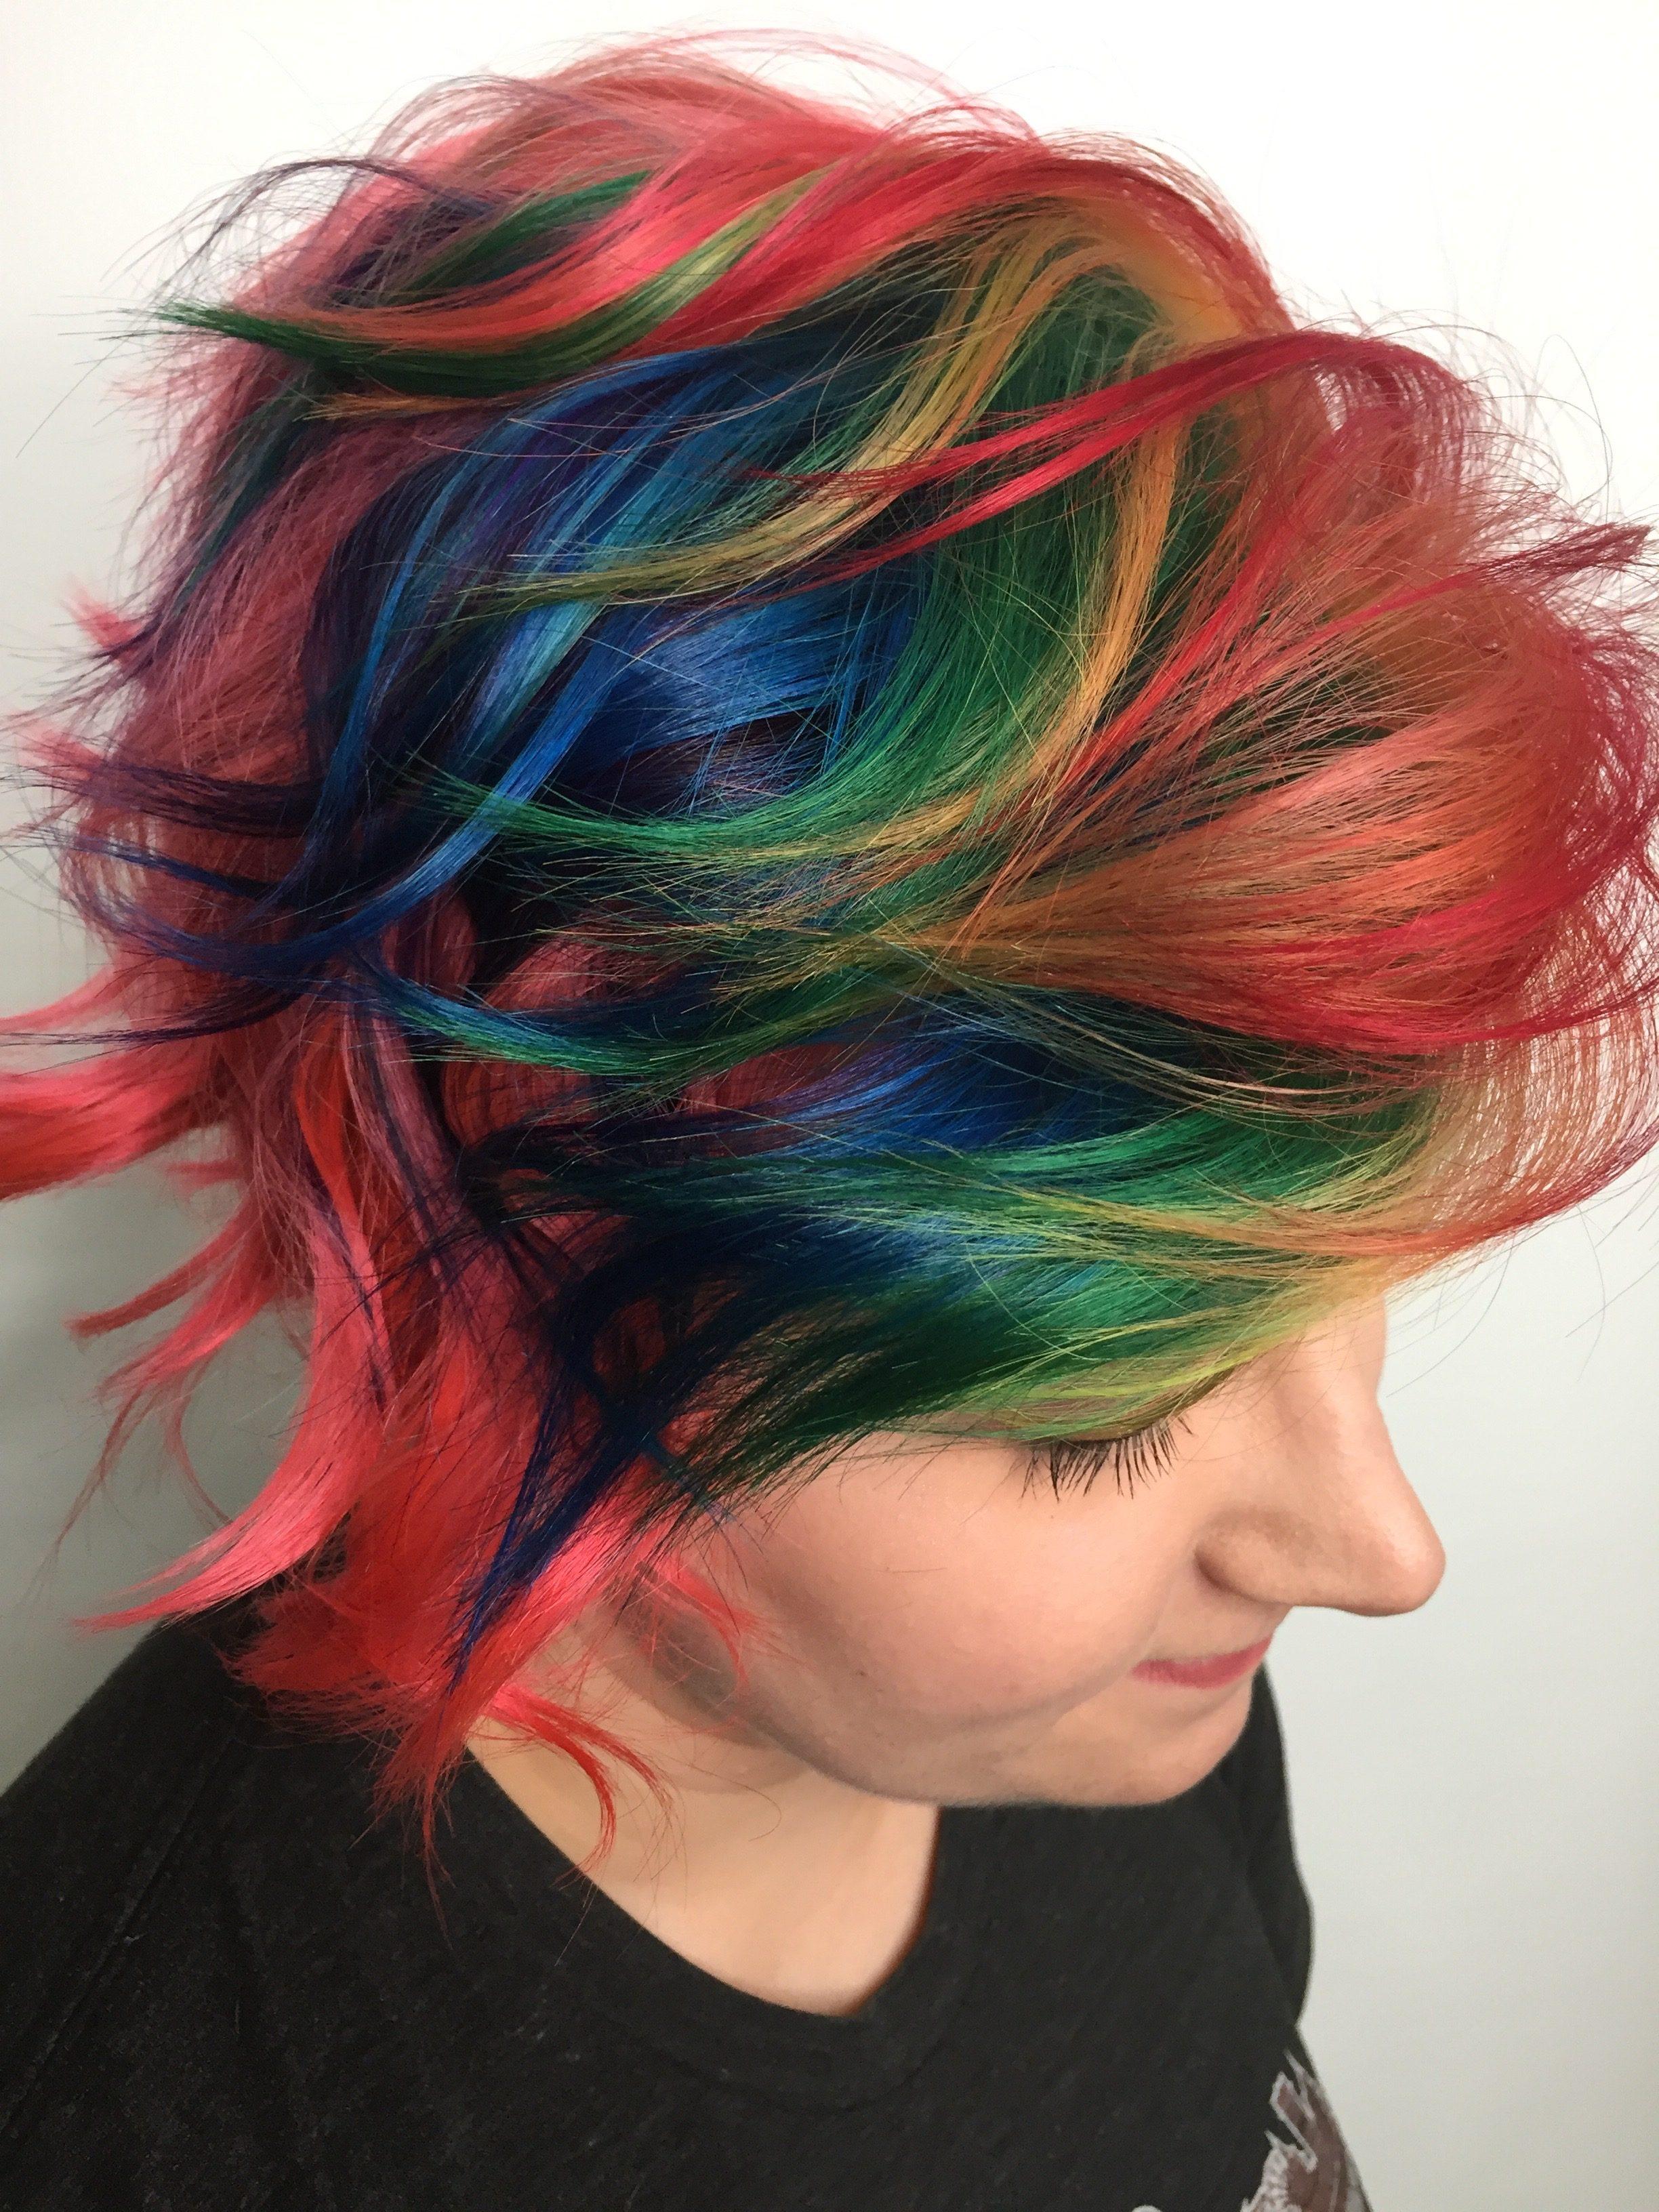 Rainbow hair style Saskatoon